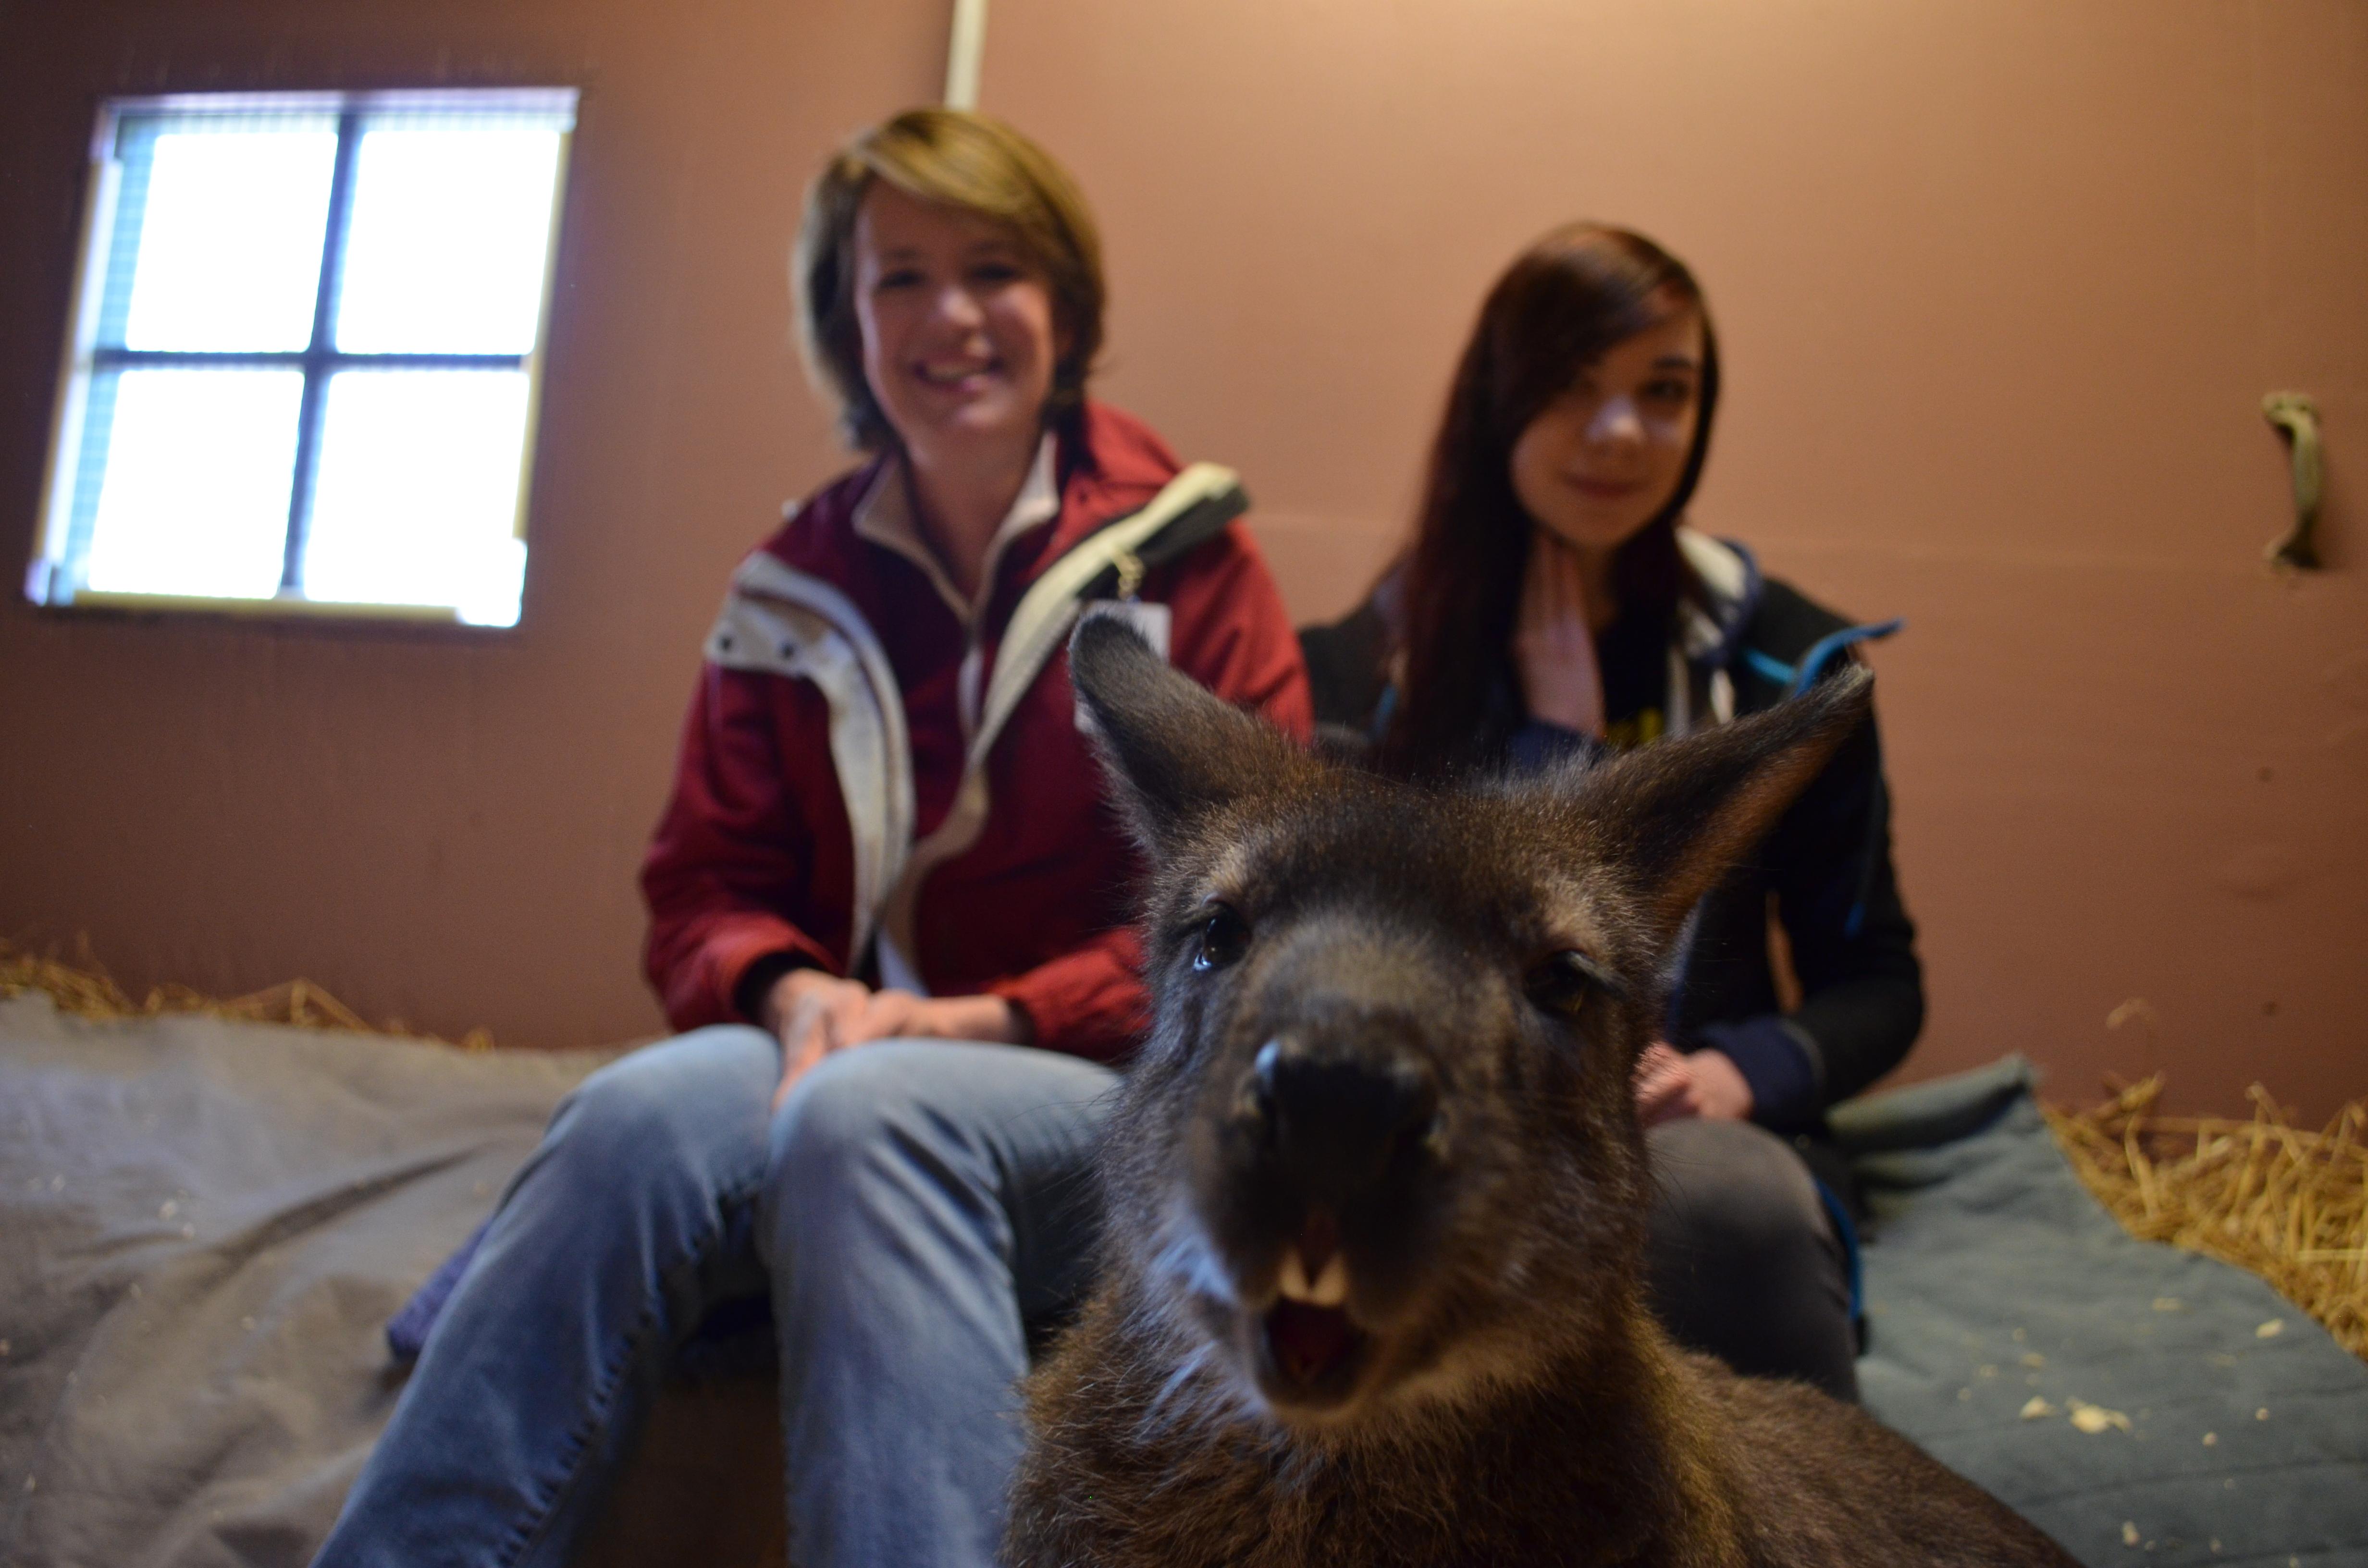 Behind The Scenes Experiences The Cincinnati Zoo